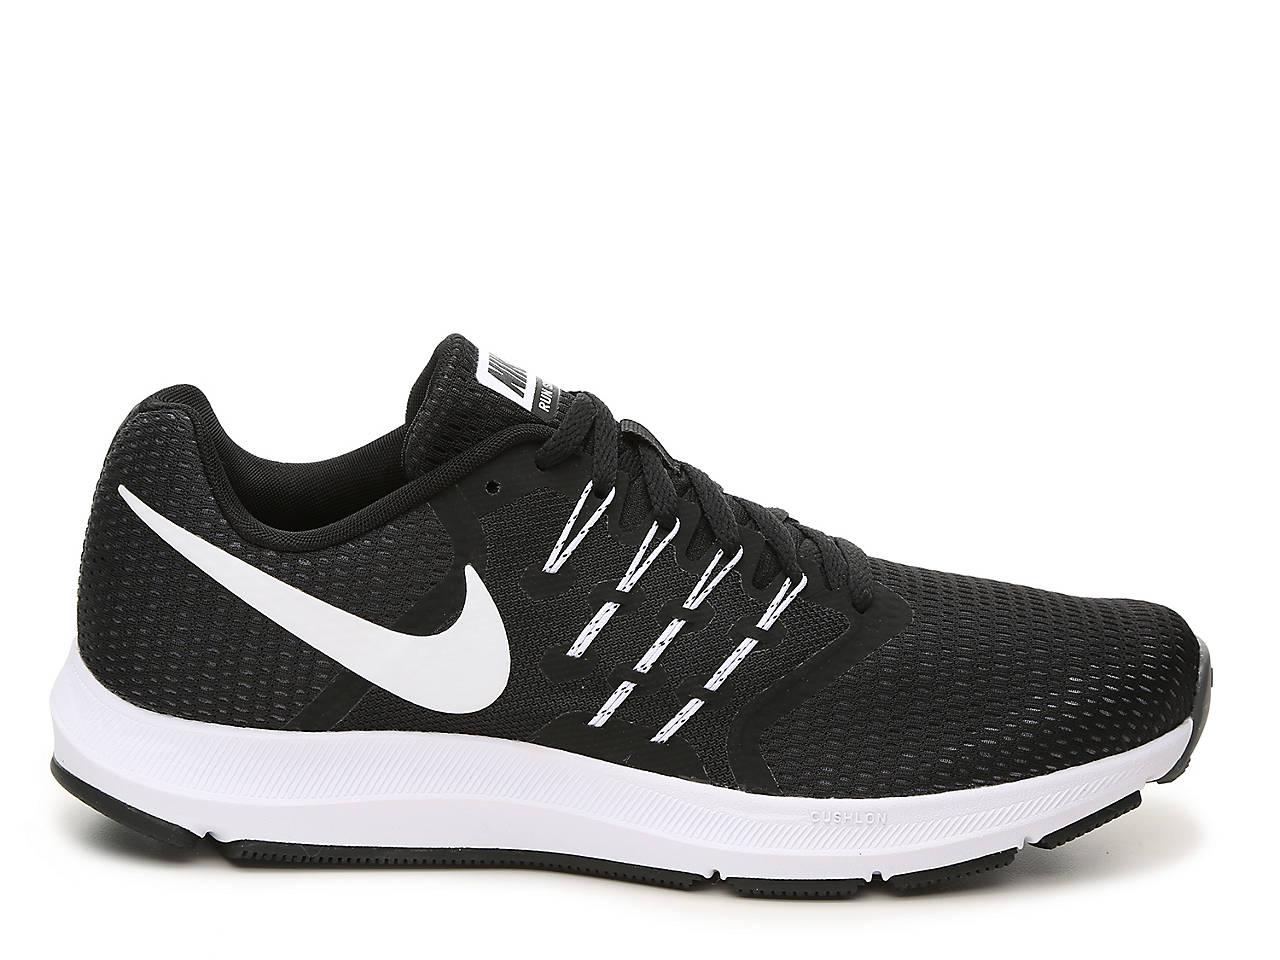 Nike Run Swift Lightweight Running Shoe - Men's Men's